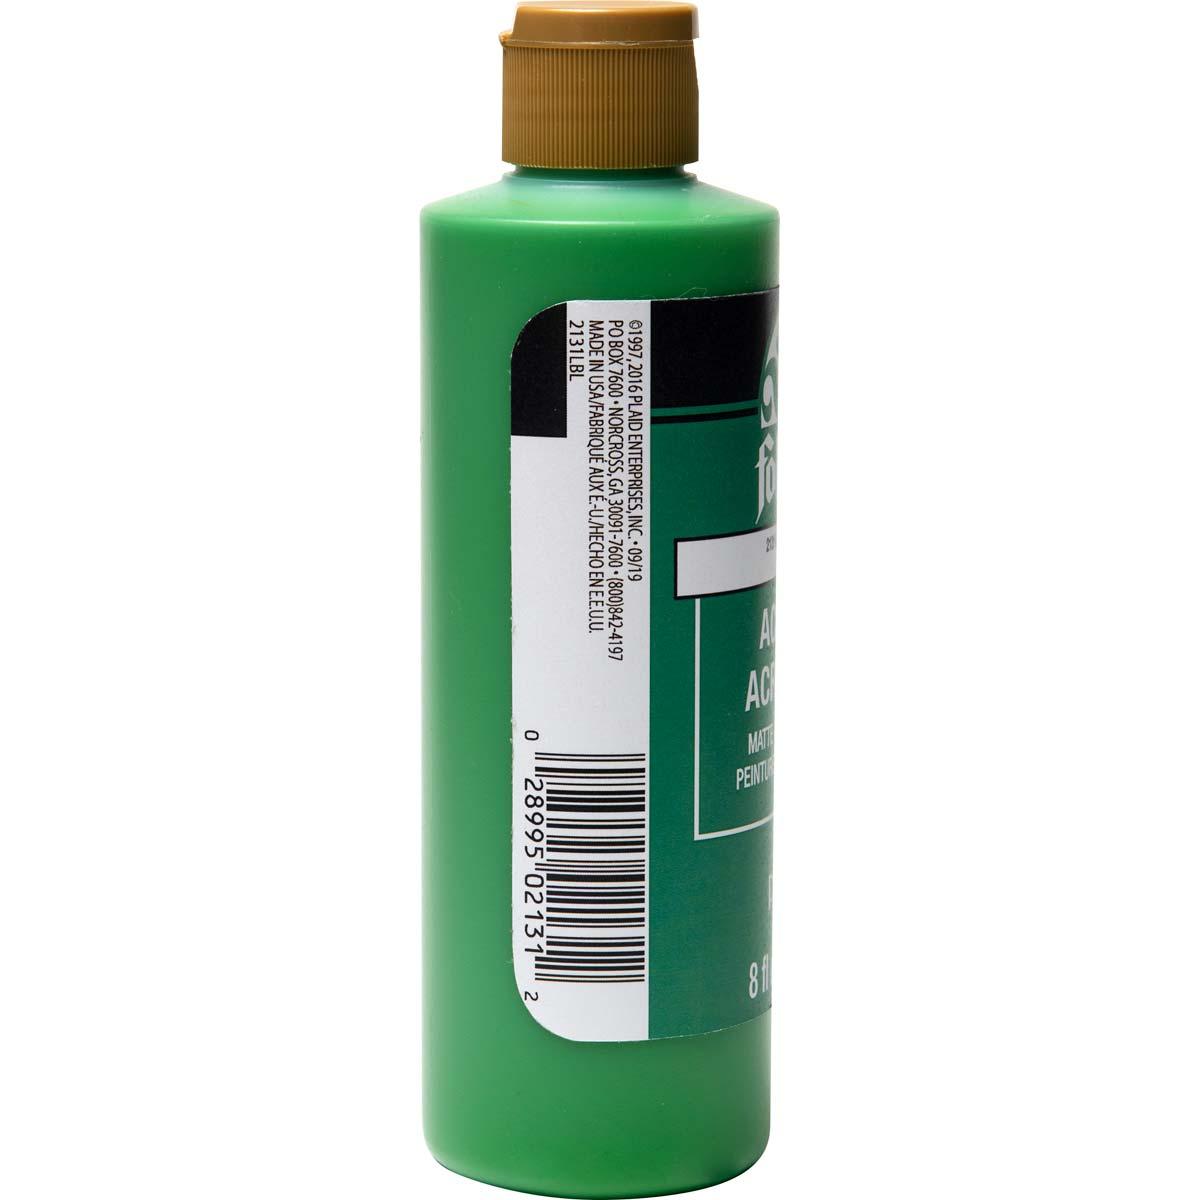 FolkArt ® Acrylic Colors - Bright Green, 8 oz. - 2131